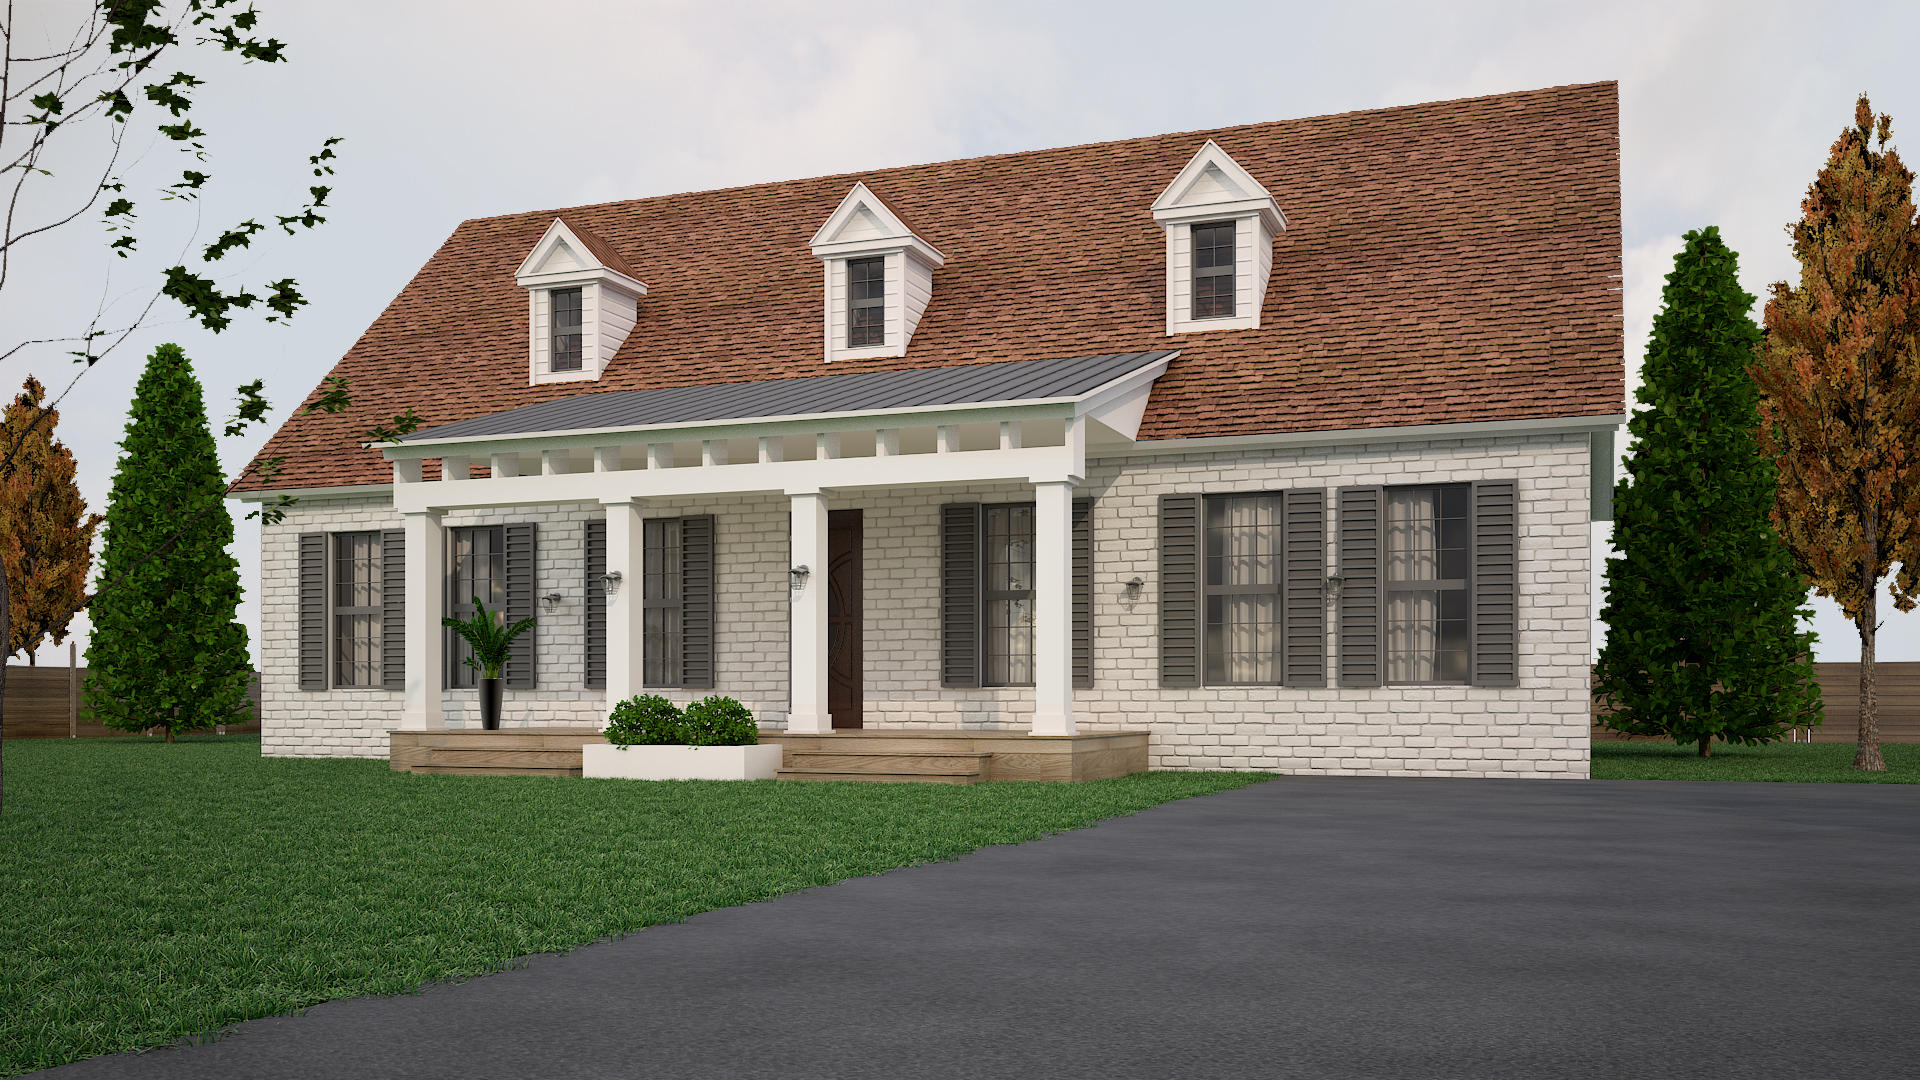 Old Mt Pleasant Homes For Sale - 1496 Goblet, Mount Pleasant, SC - 0